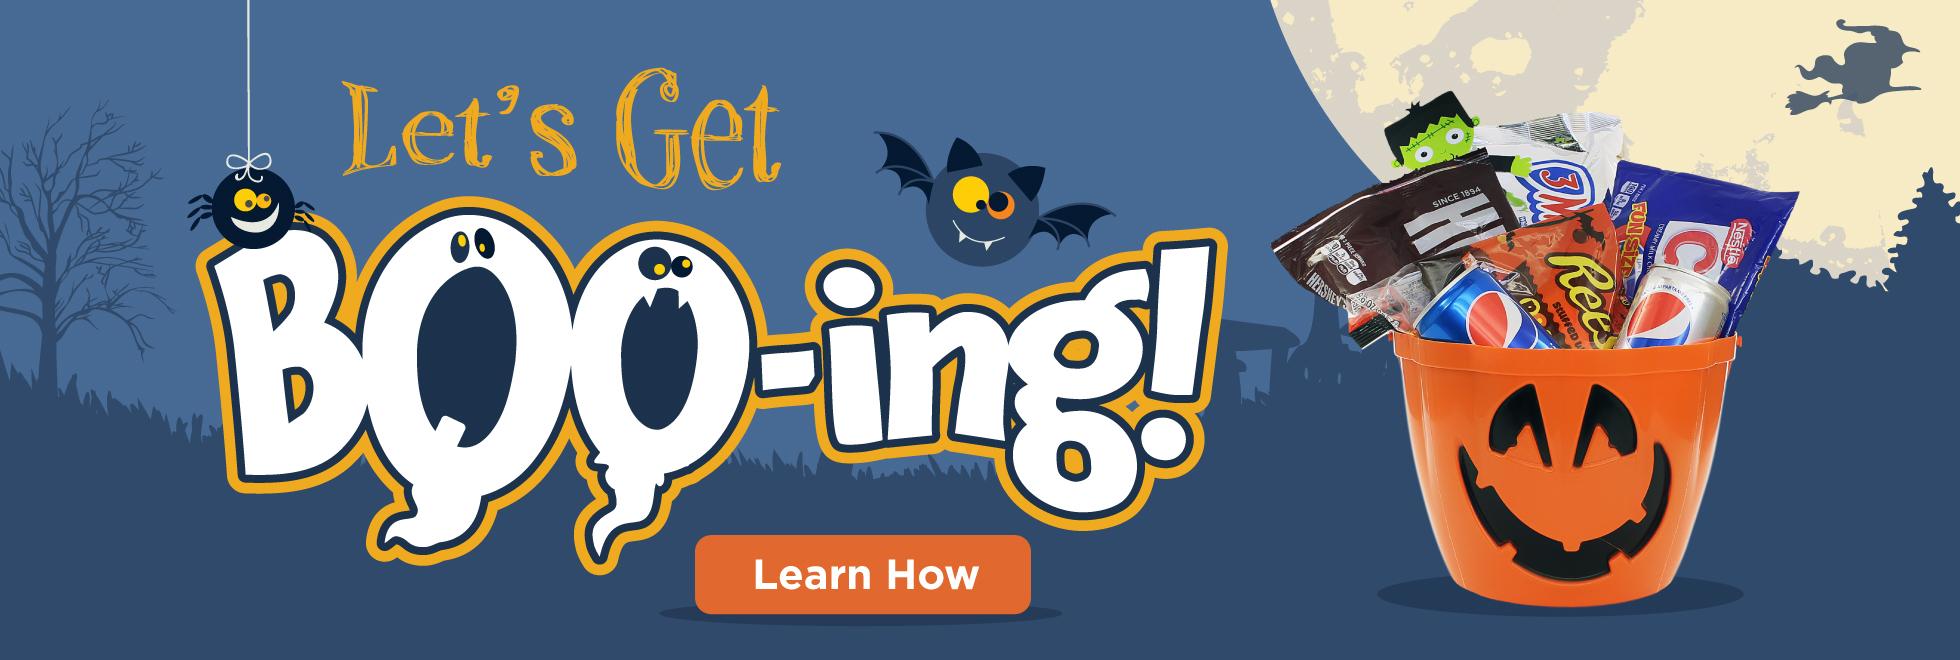 Let's Get Boo-ing